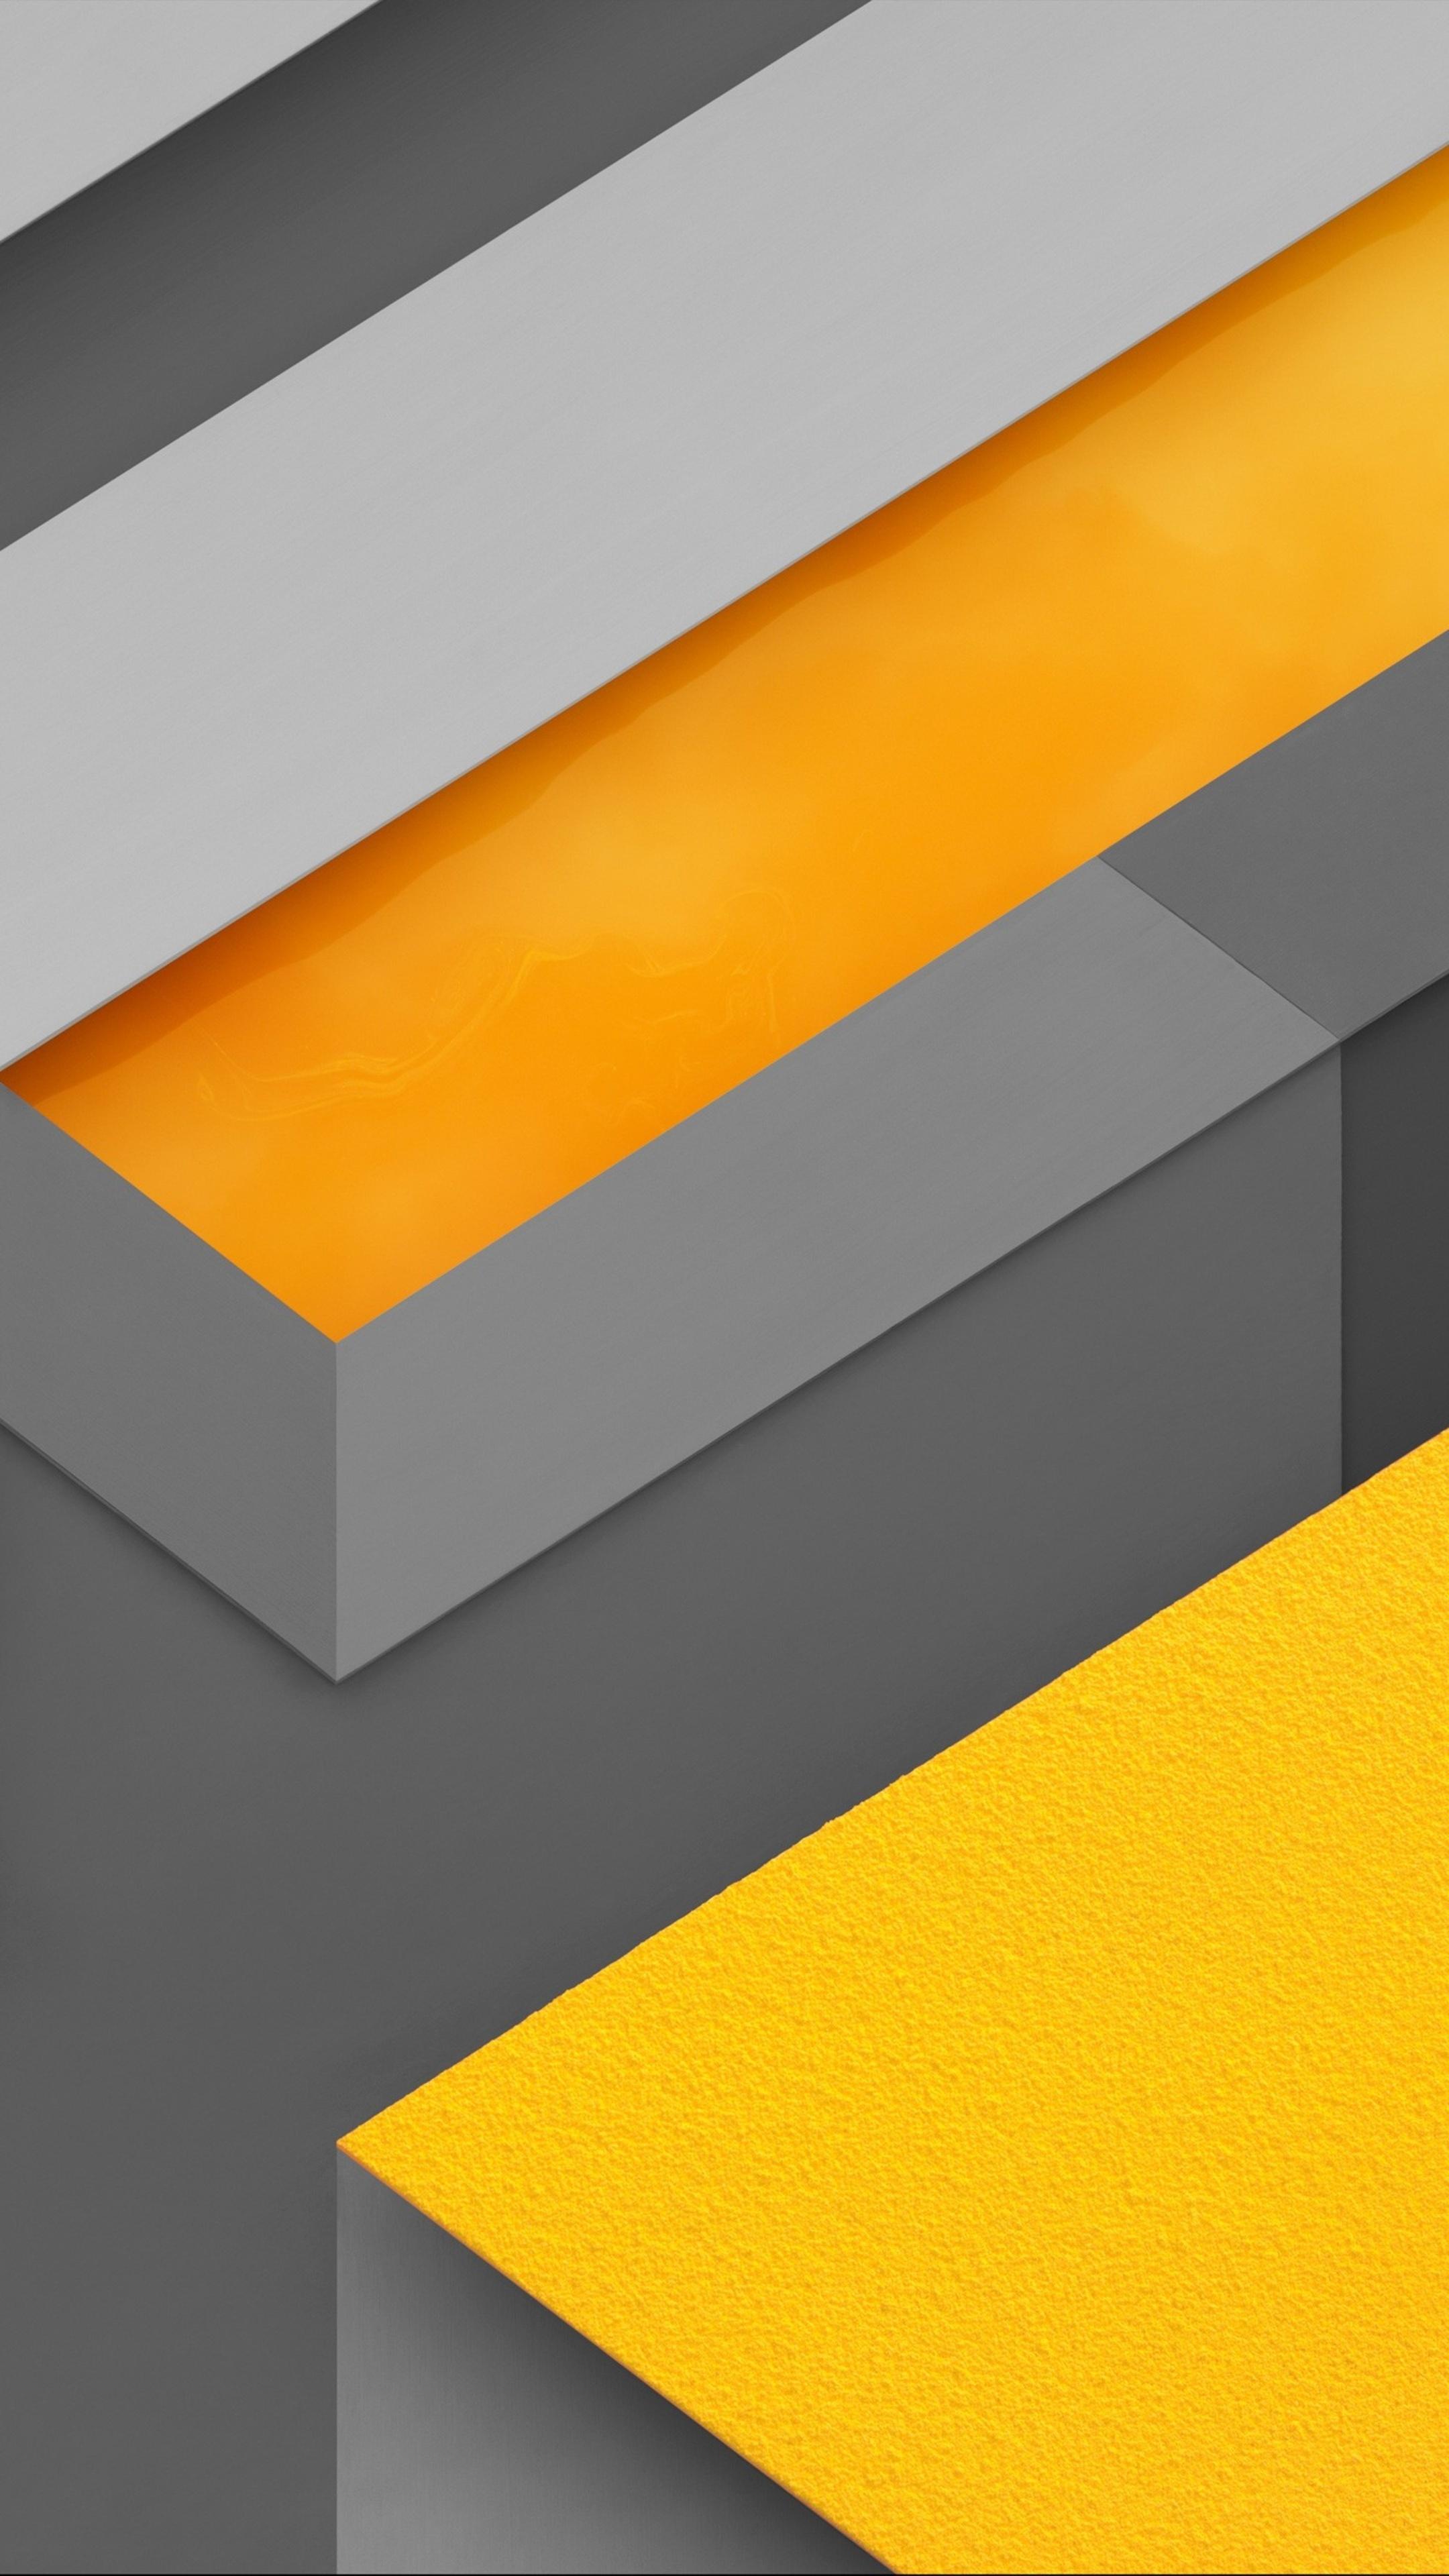 yellow-lines-geometry-71.jpg